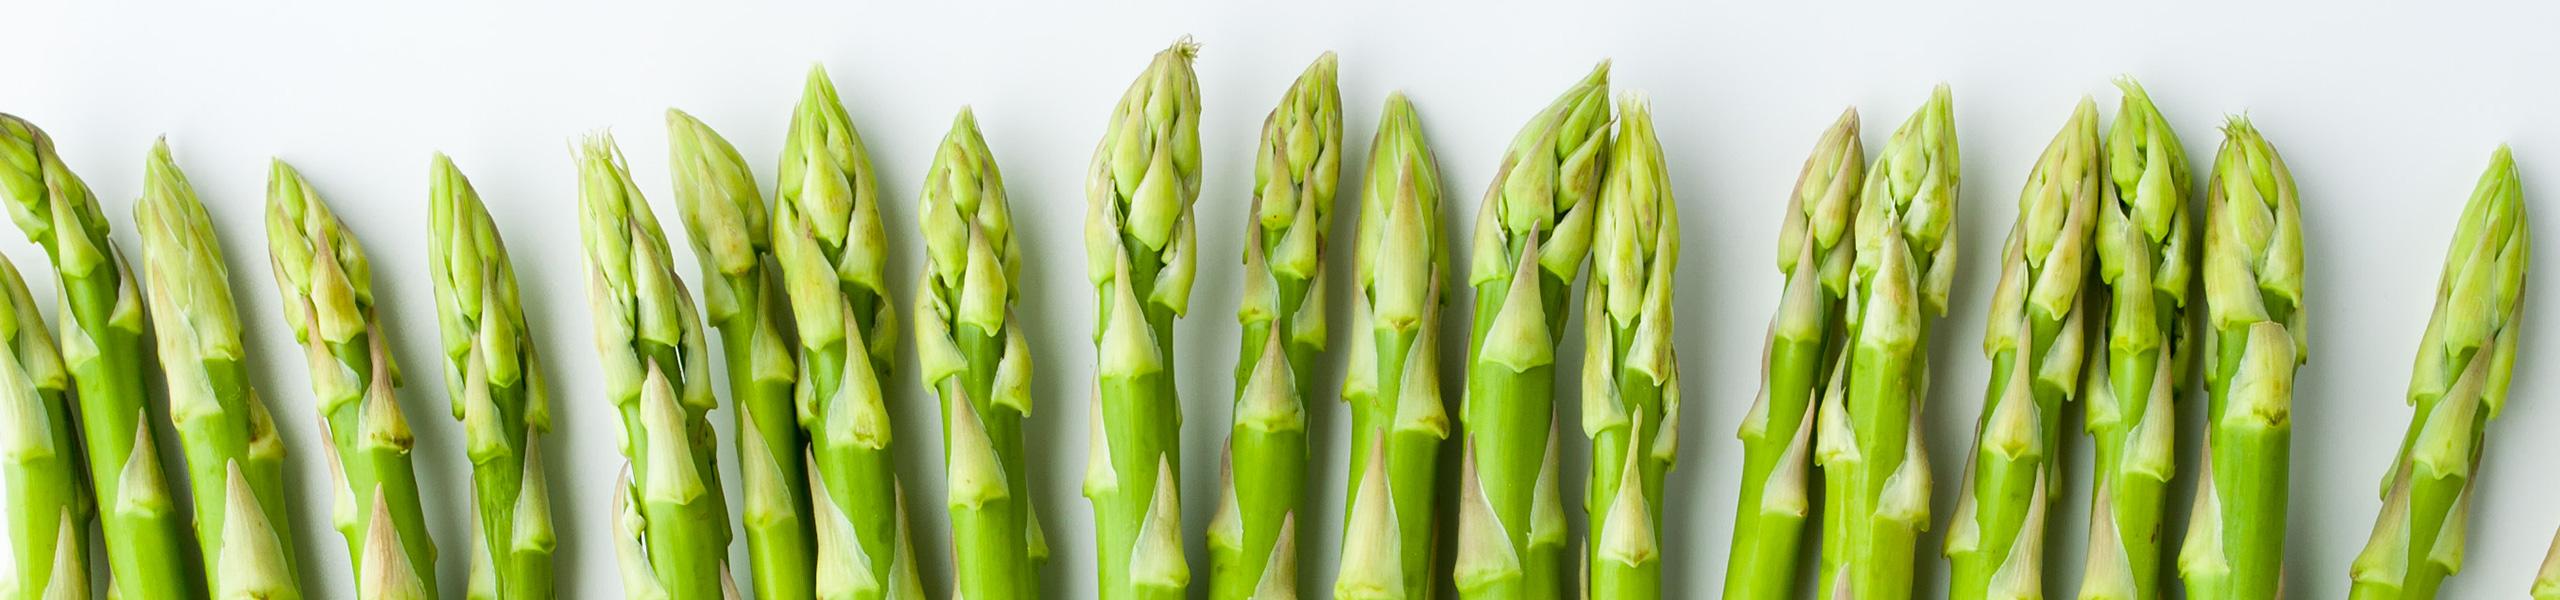 Asparagi verdi nostrani fini